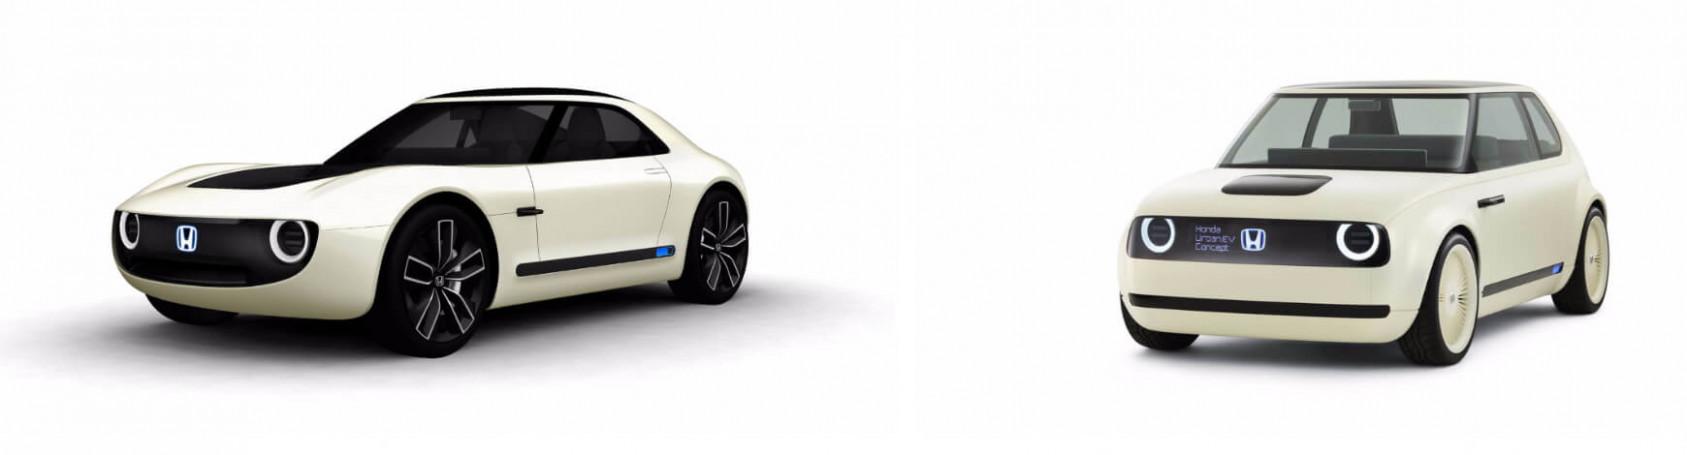 Redesign and Review 2022 Honda Urban